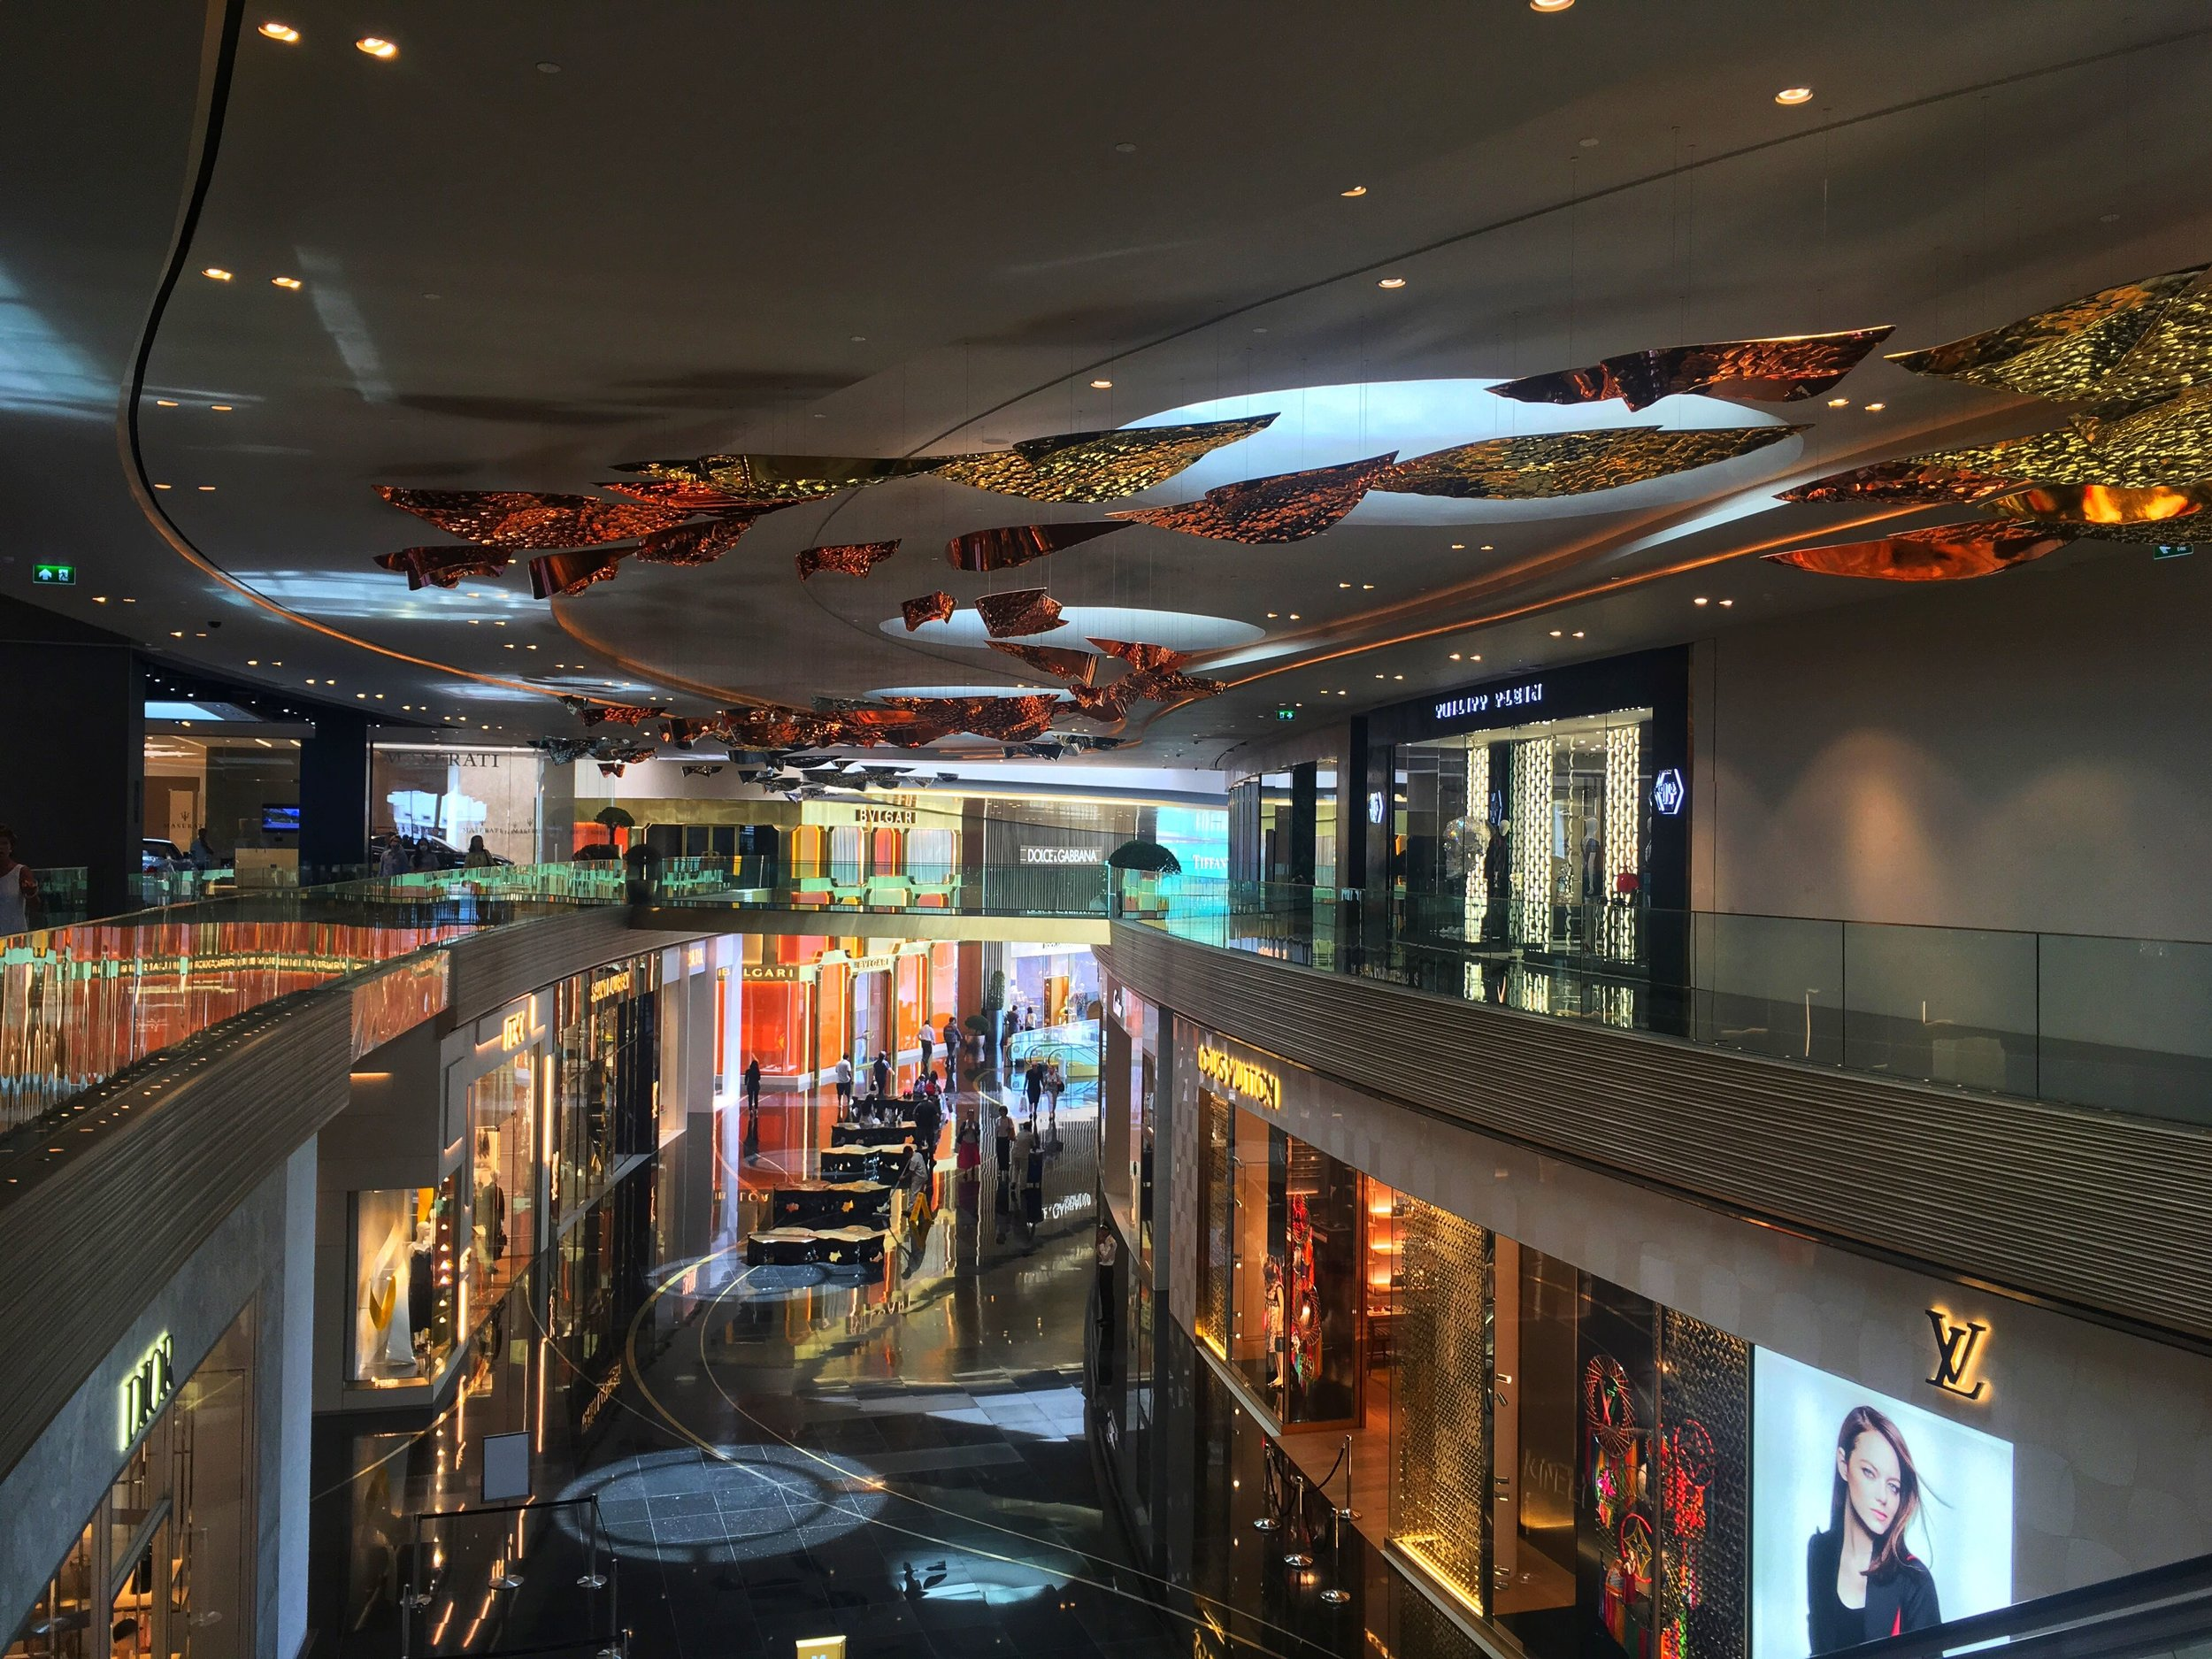 shops inside IconSiam shopping mall, Bangkok, Thailand